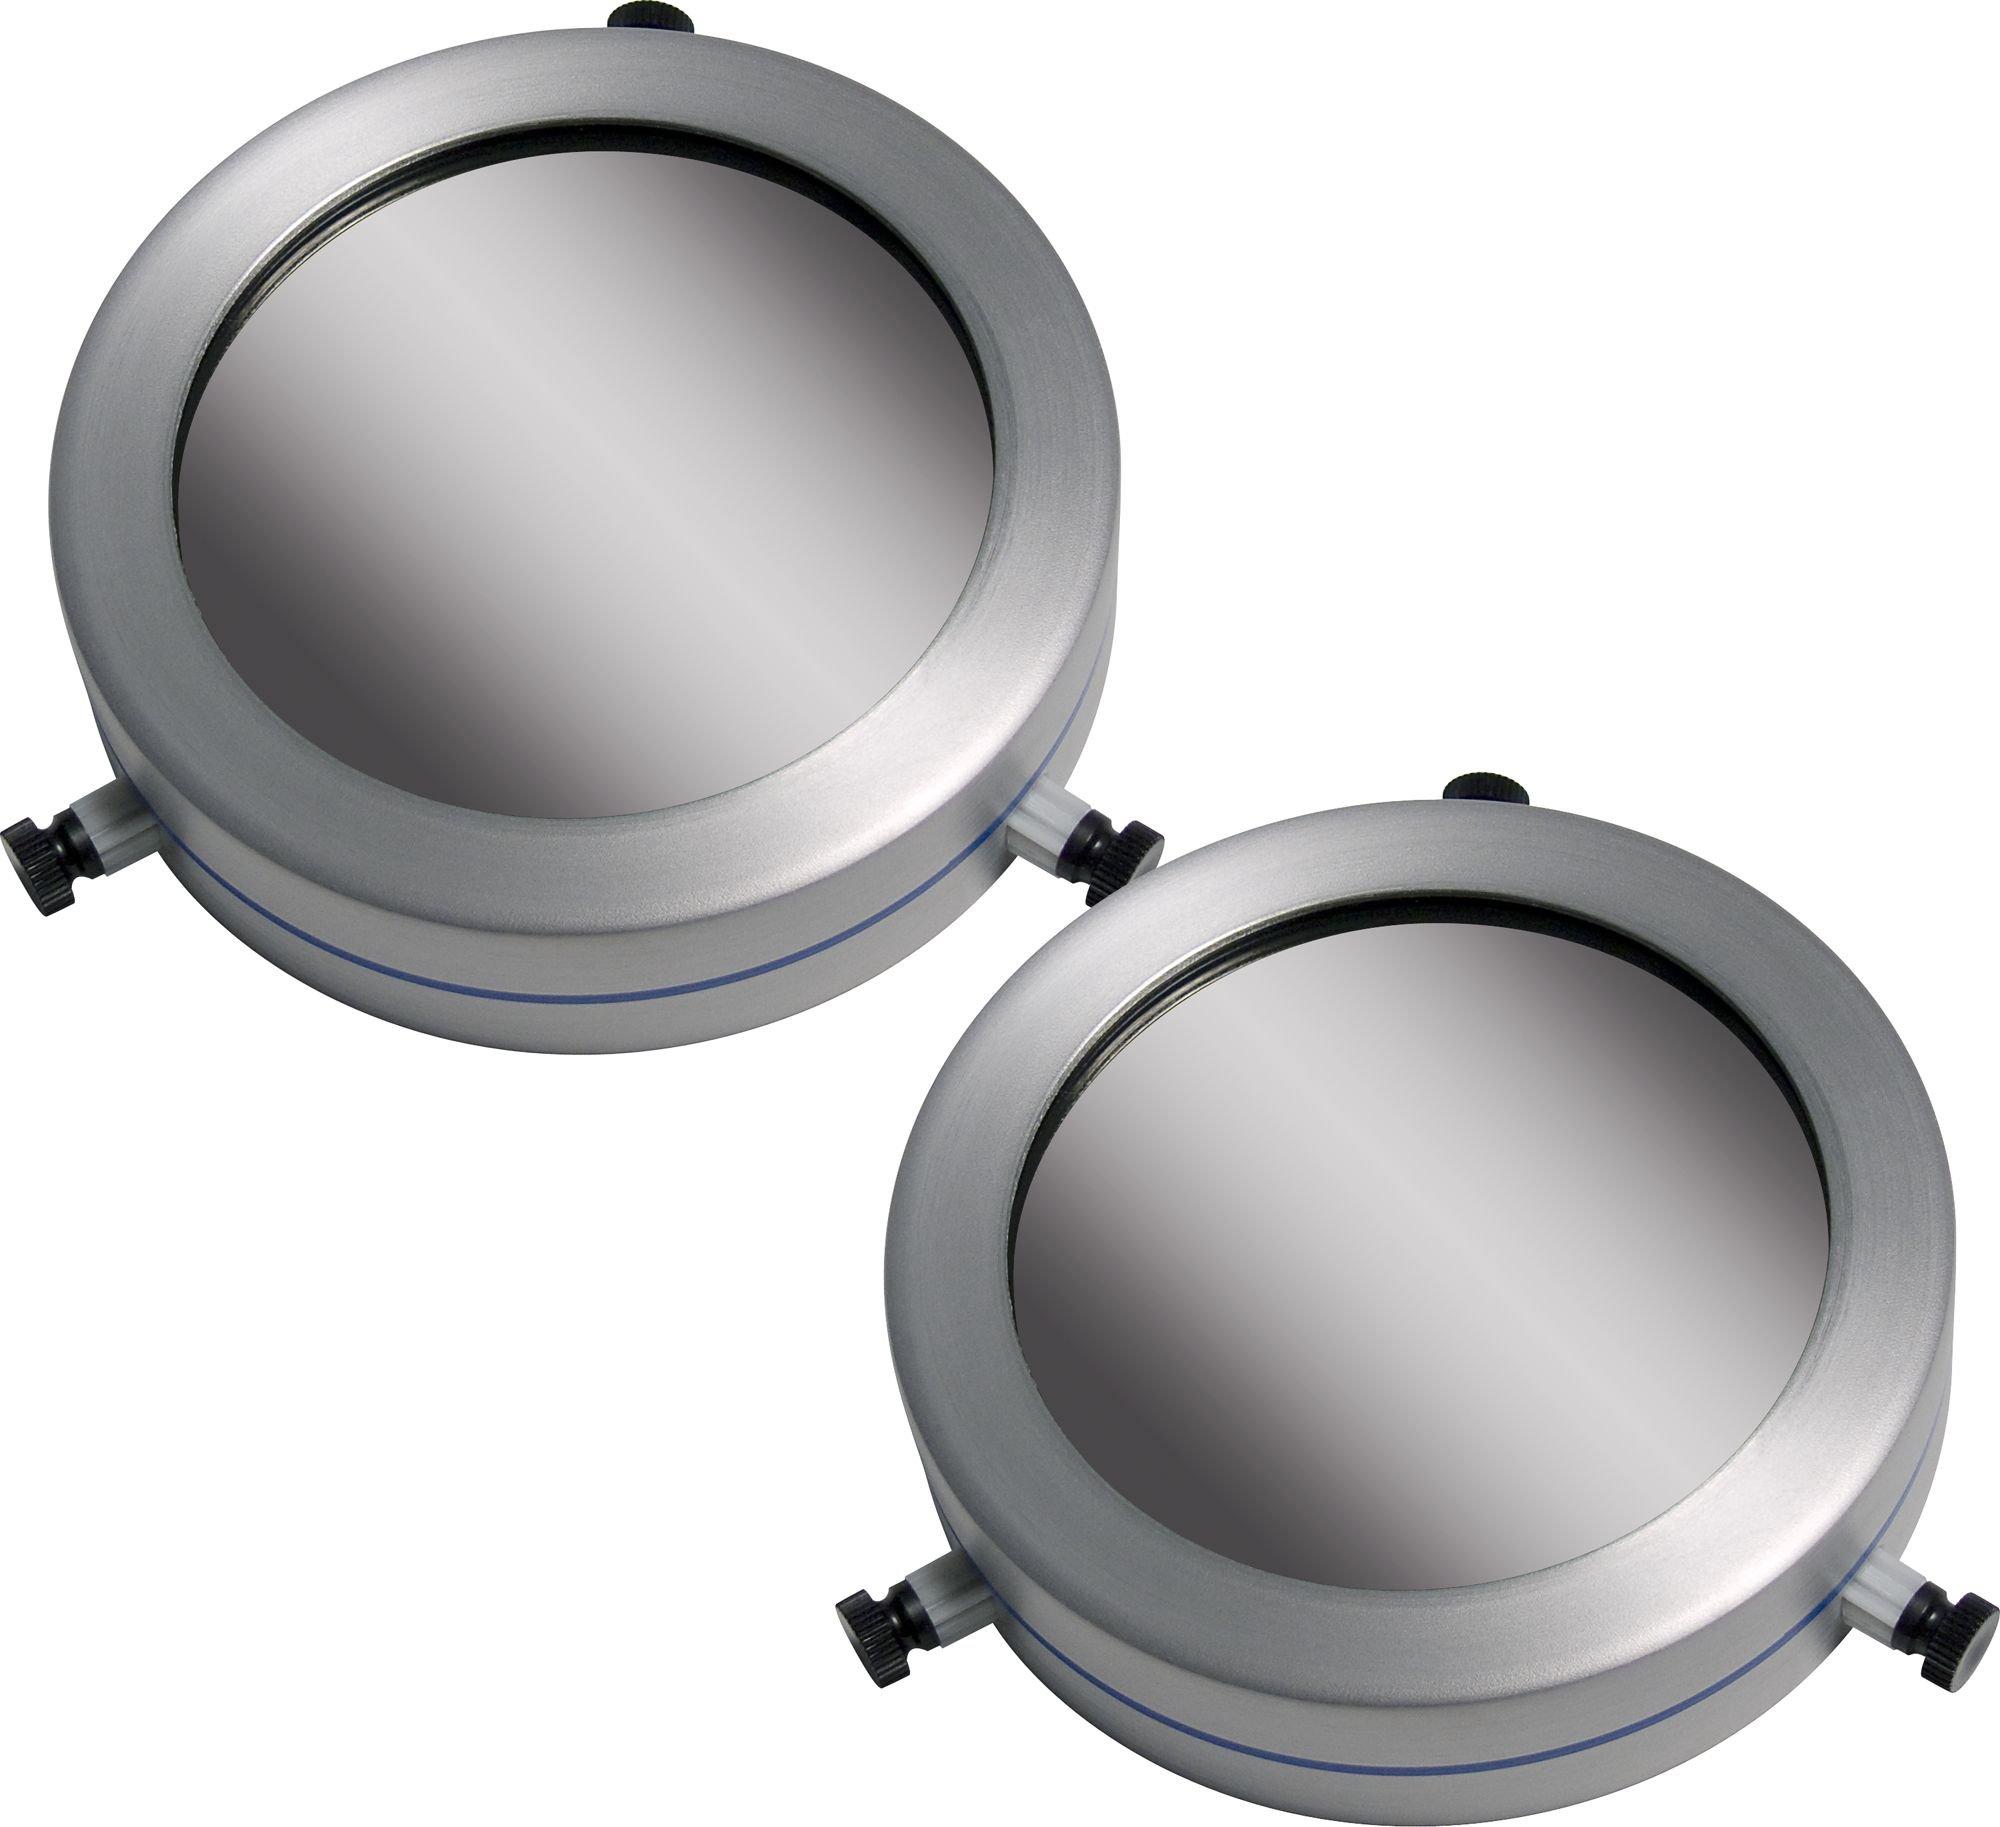 4.30'' ID Set of Orion Binocular Solar Filters